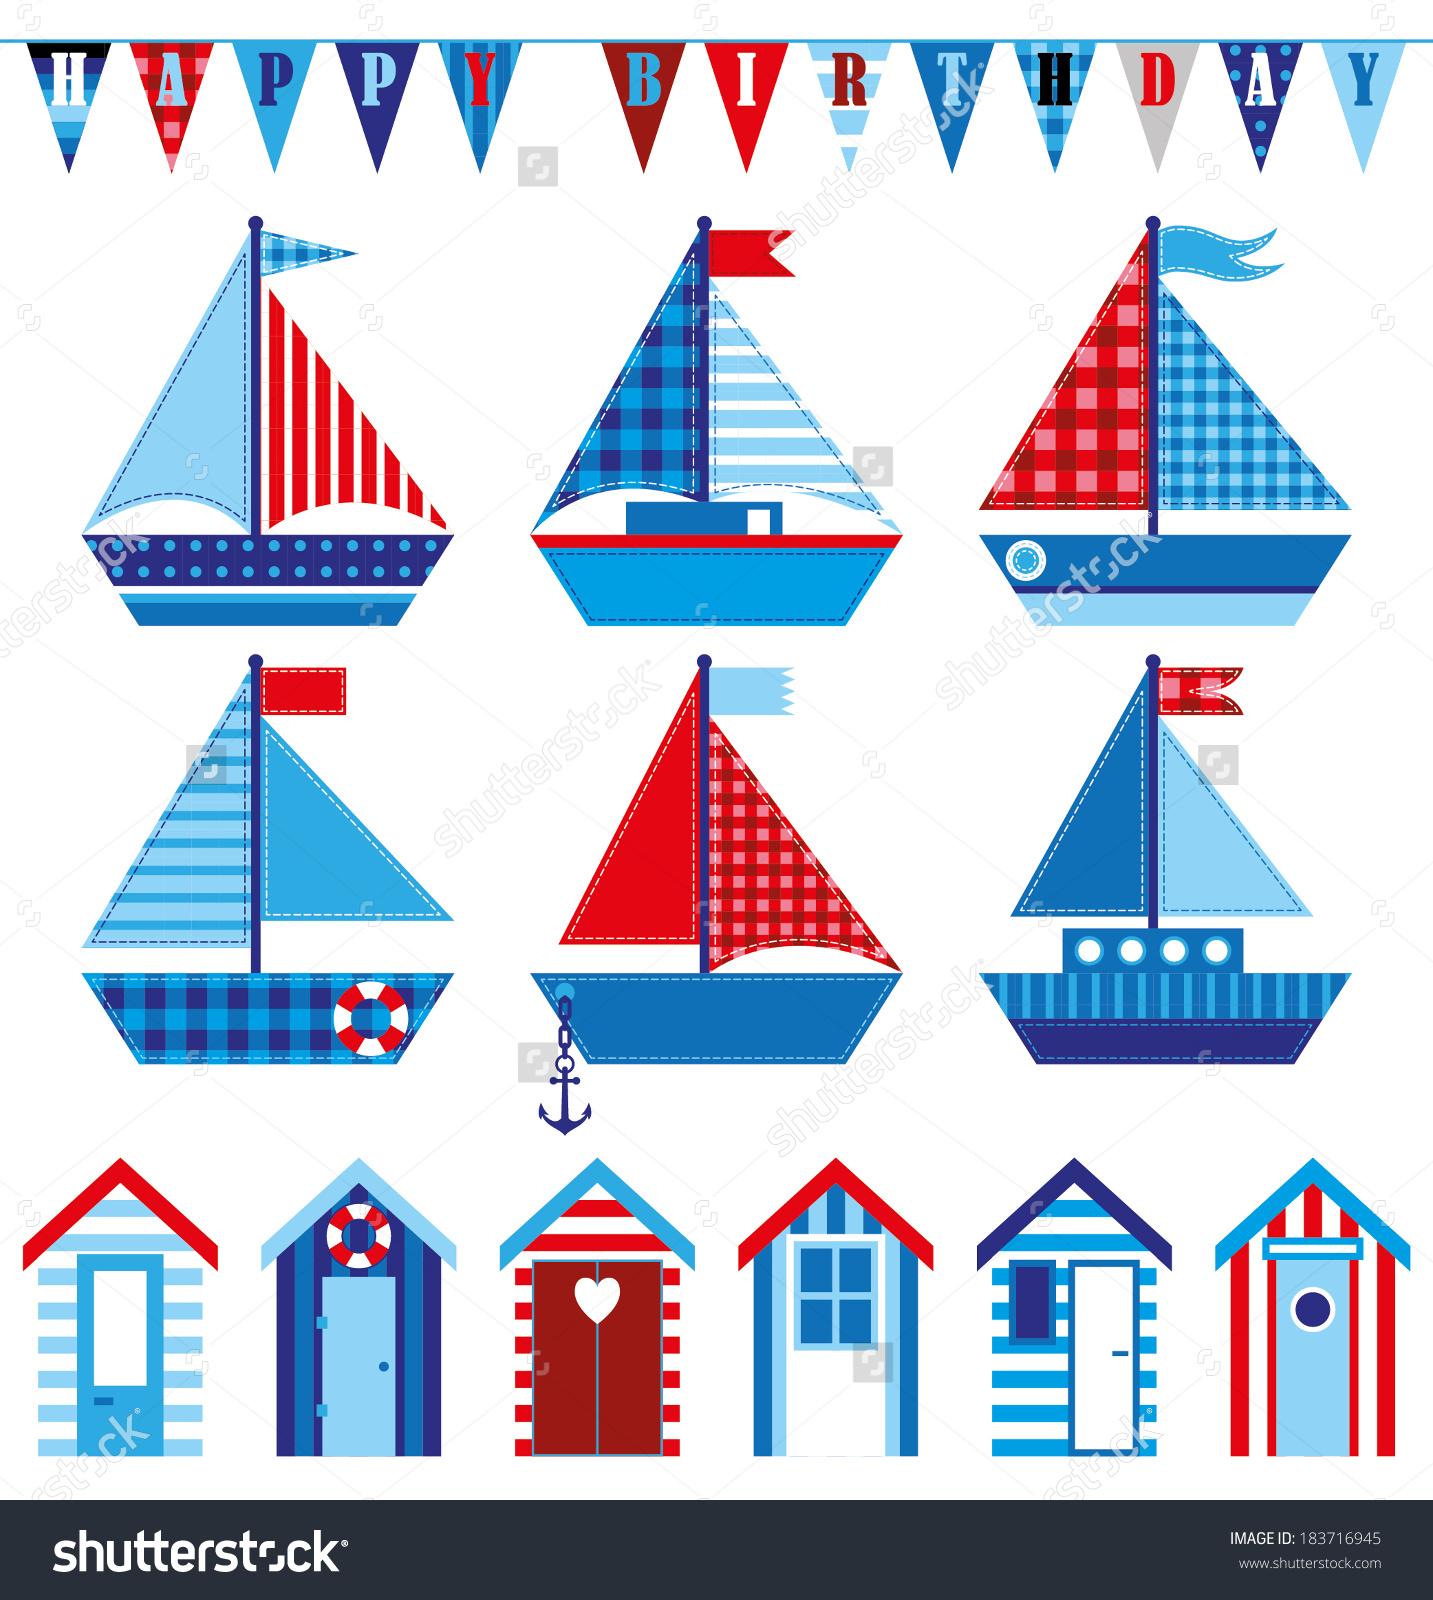 Happy Birthday Card Cute Babys Boats Stock Vector 183716945.